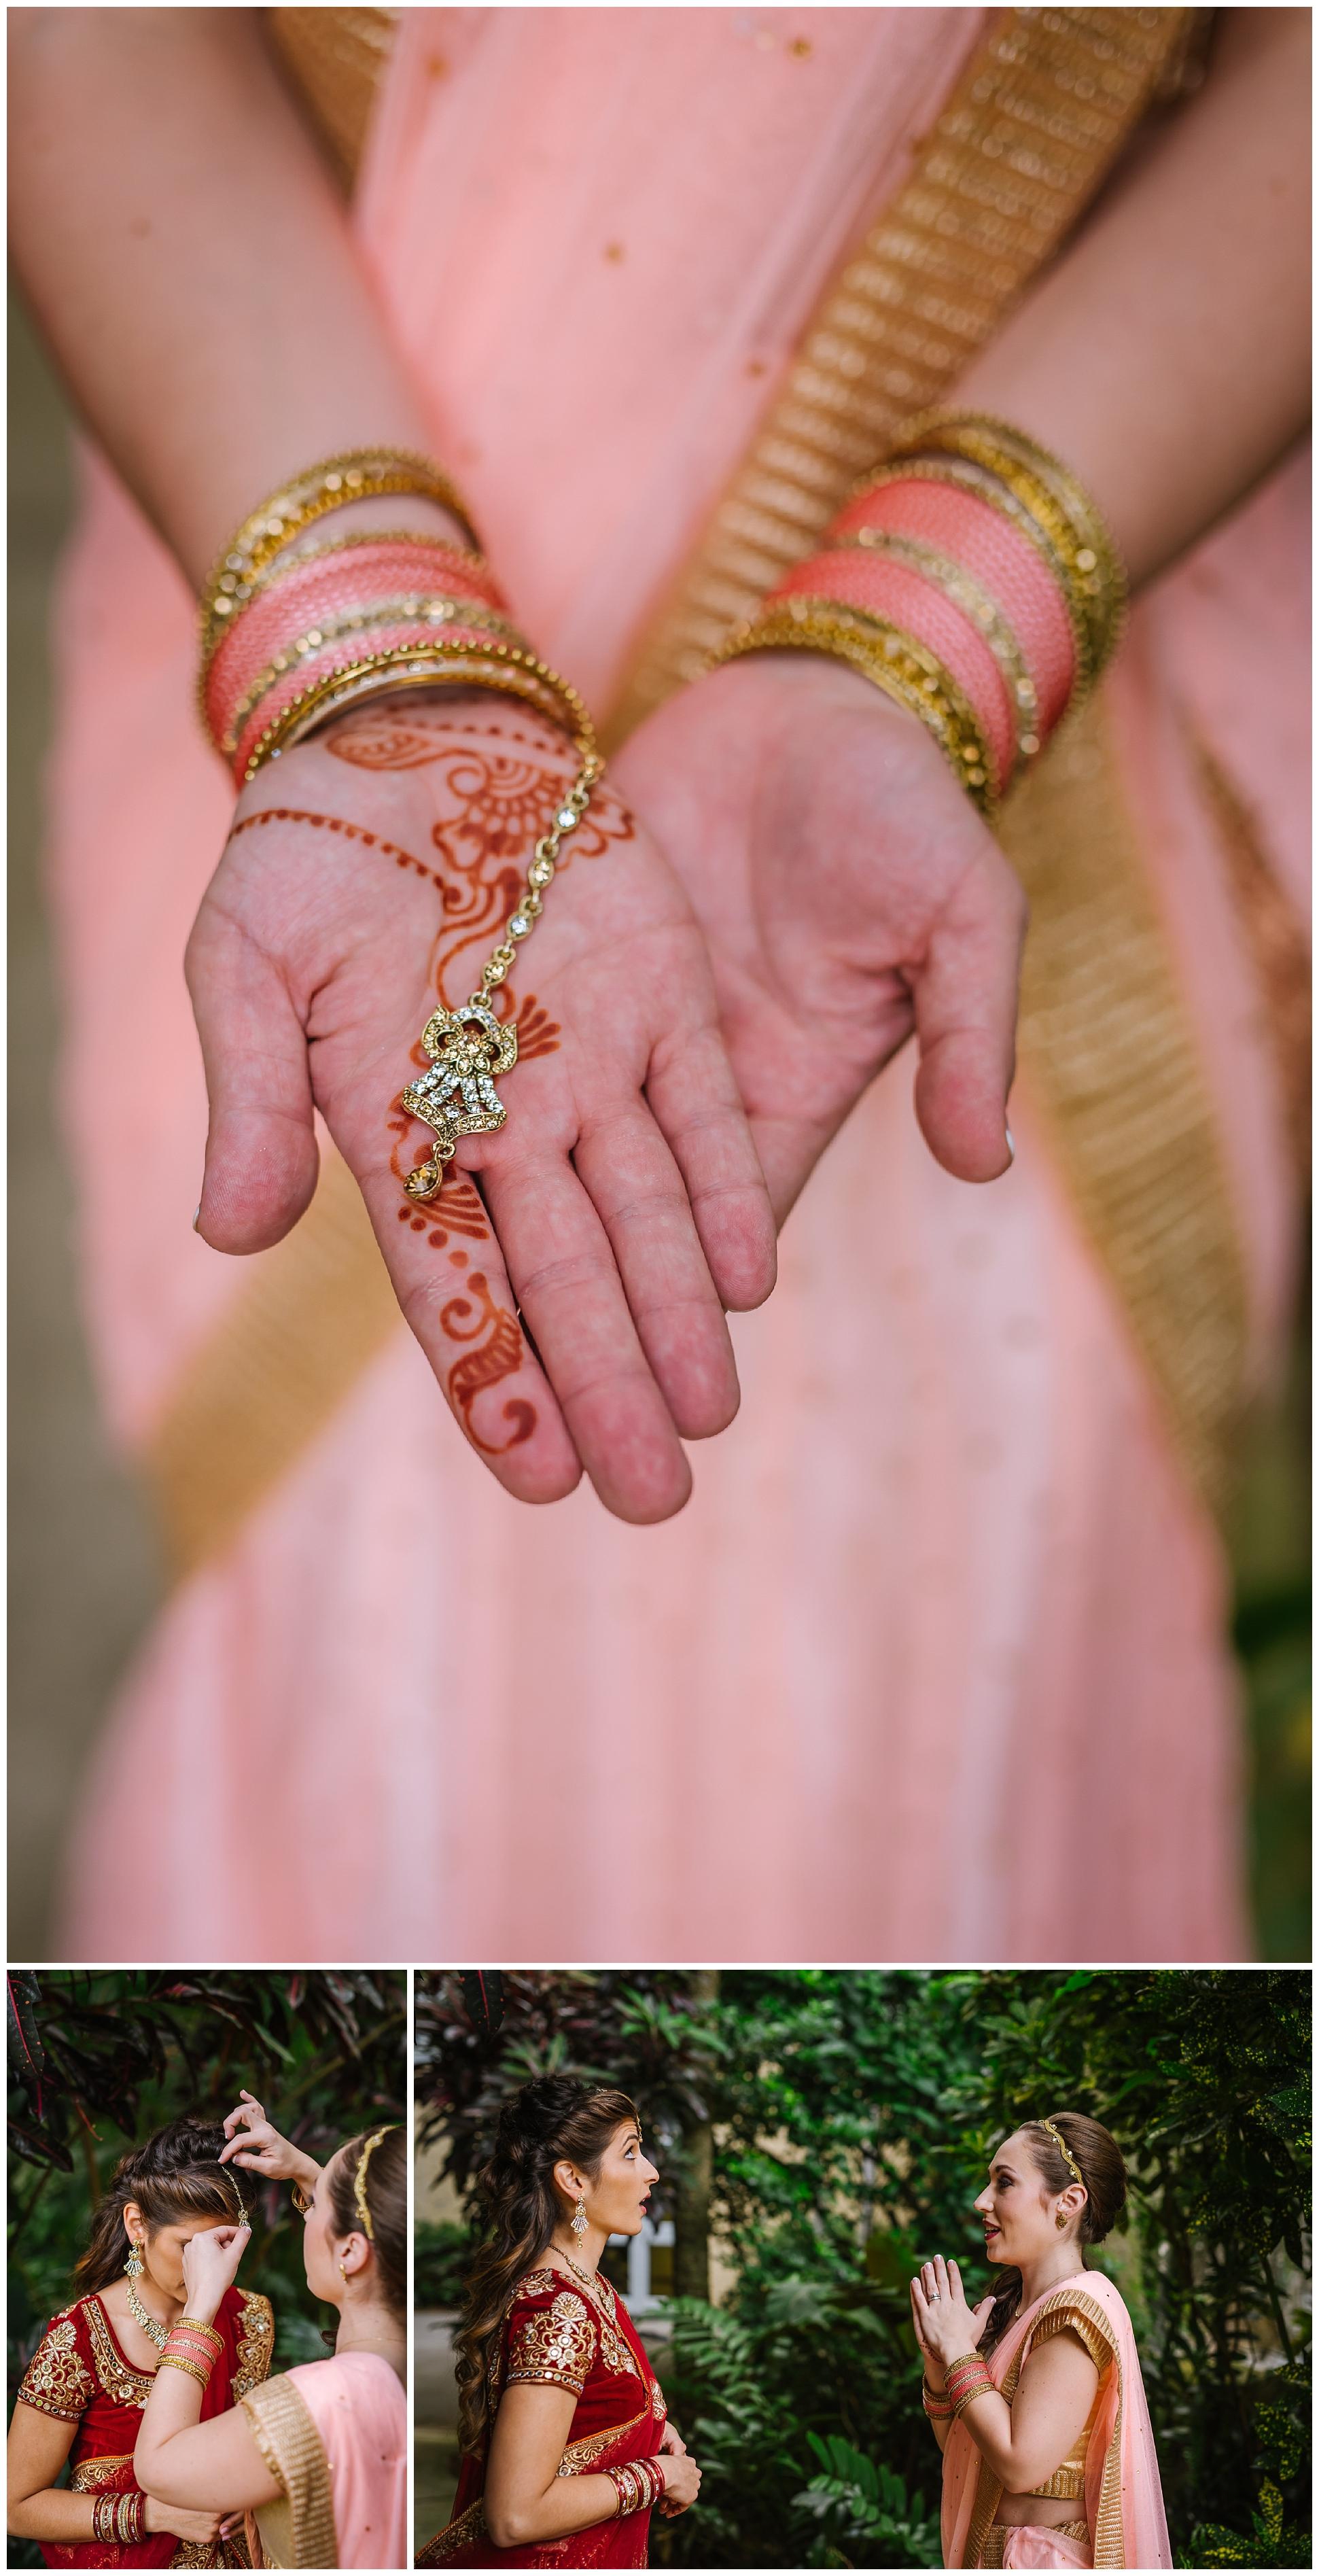 St-pete-indian-wedding-photographer-barat-sunken-gardens_0076.jpg